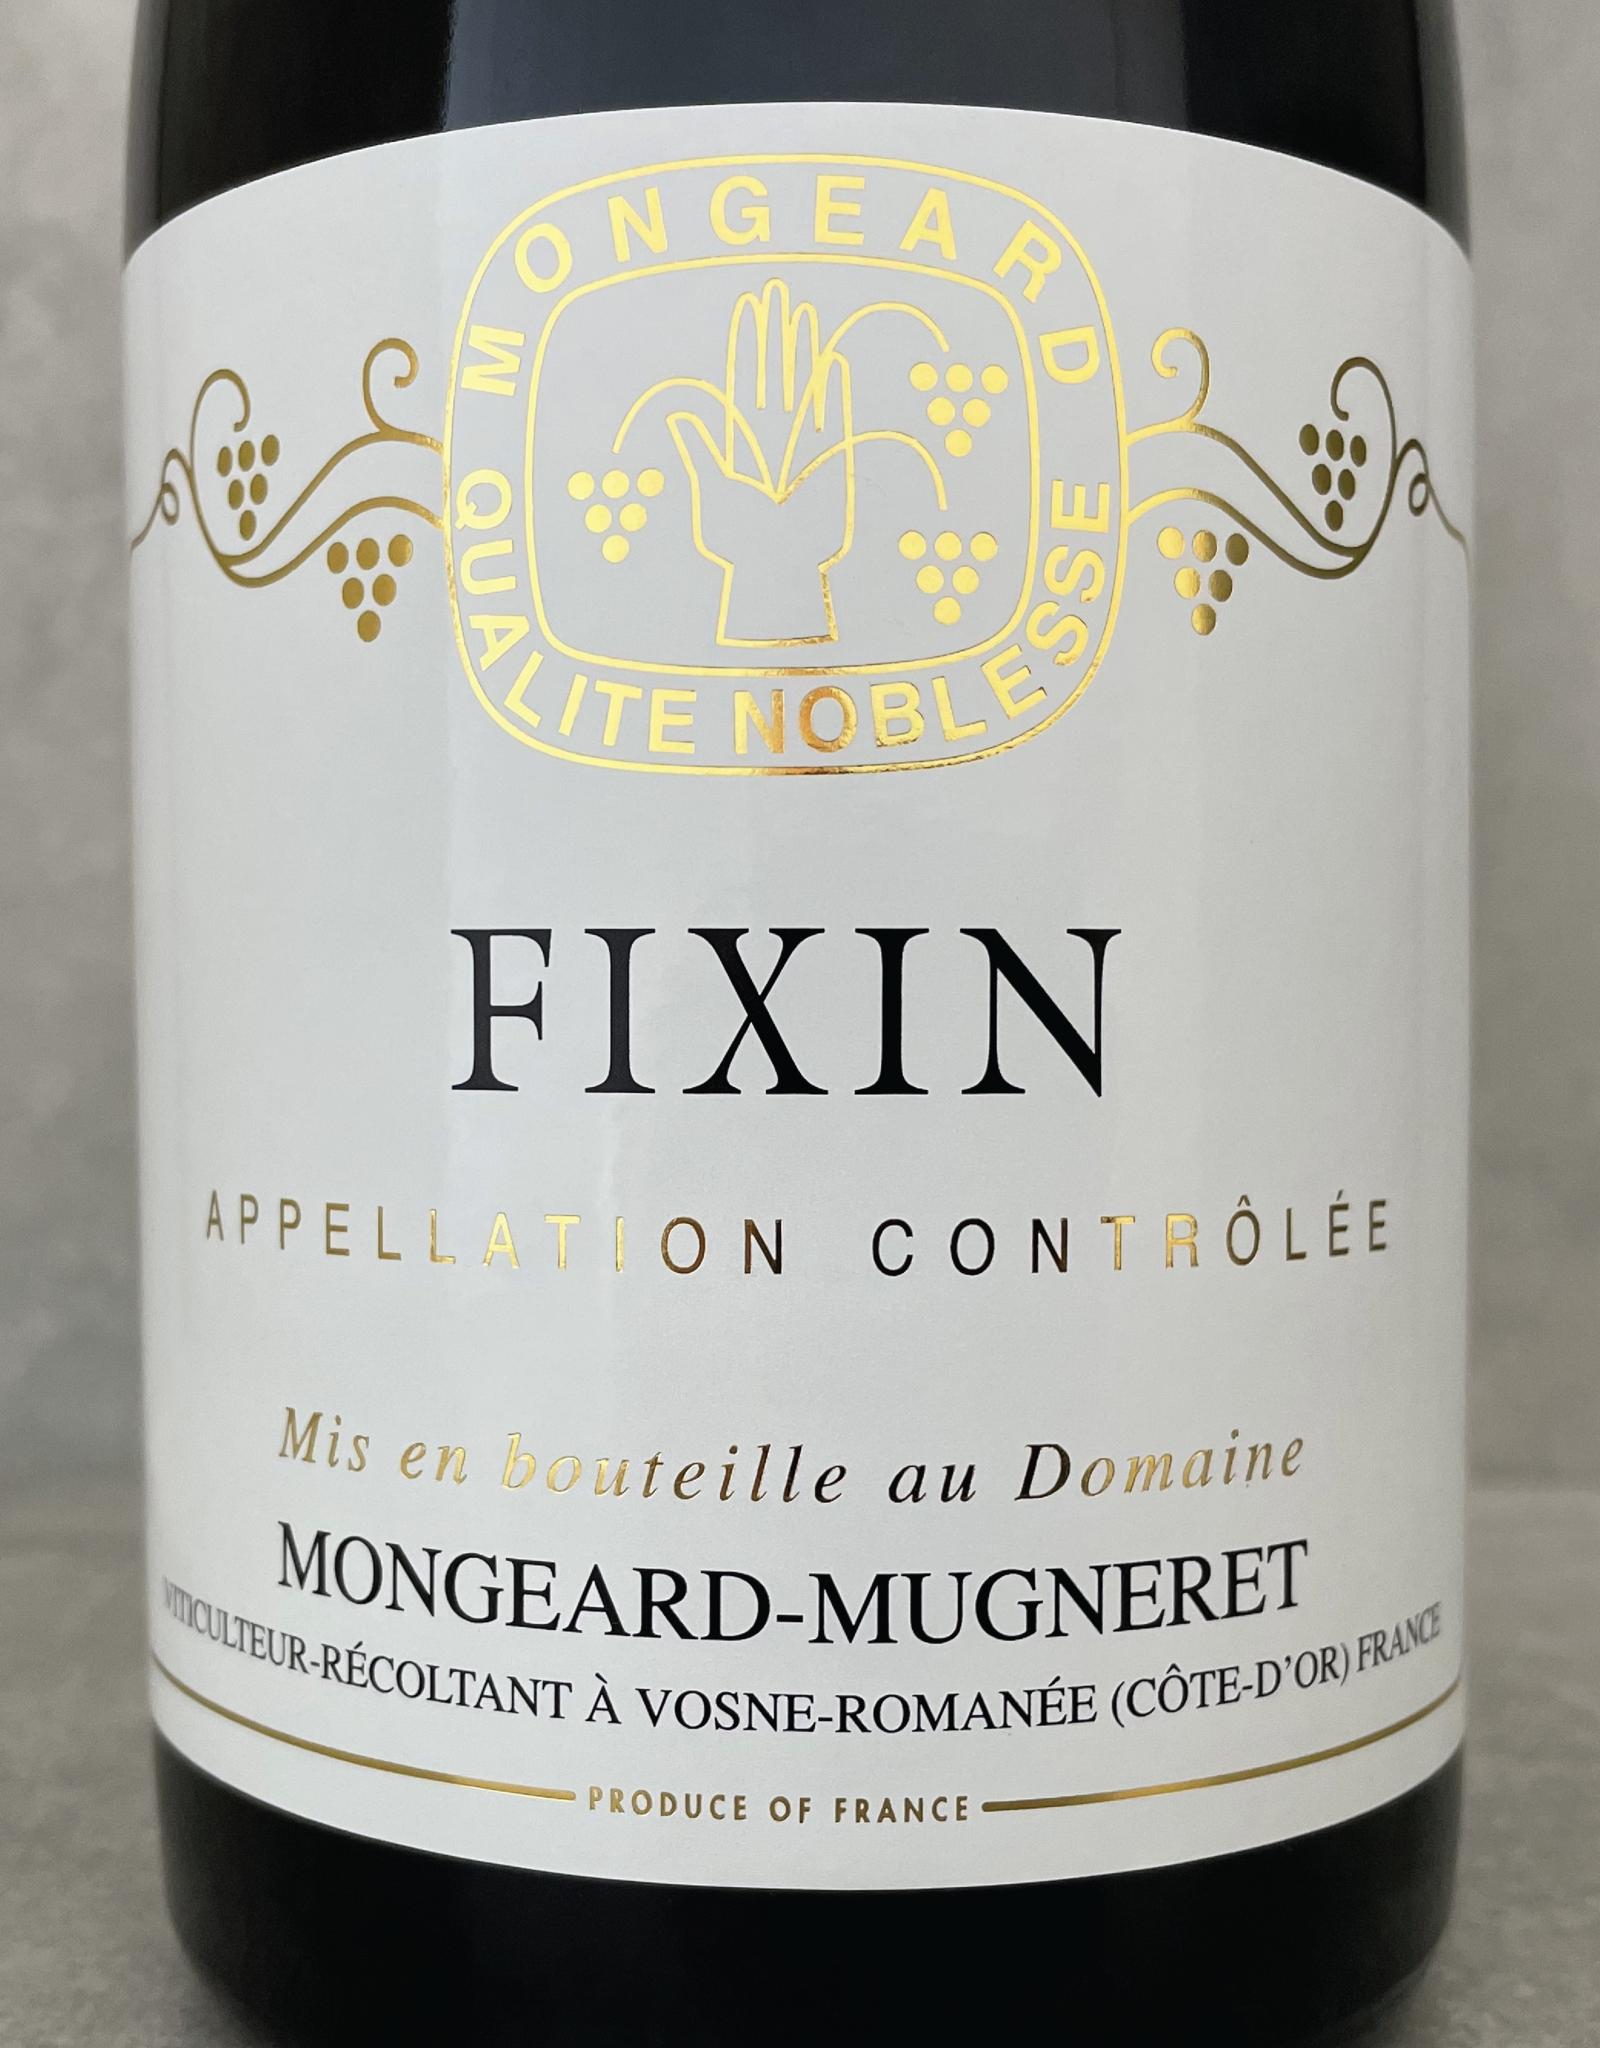 Mongeard-Mugneret Fixin 2017